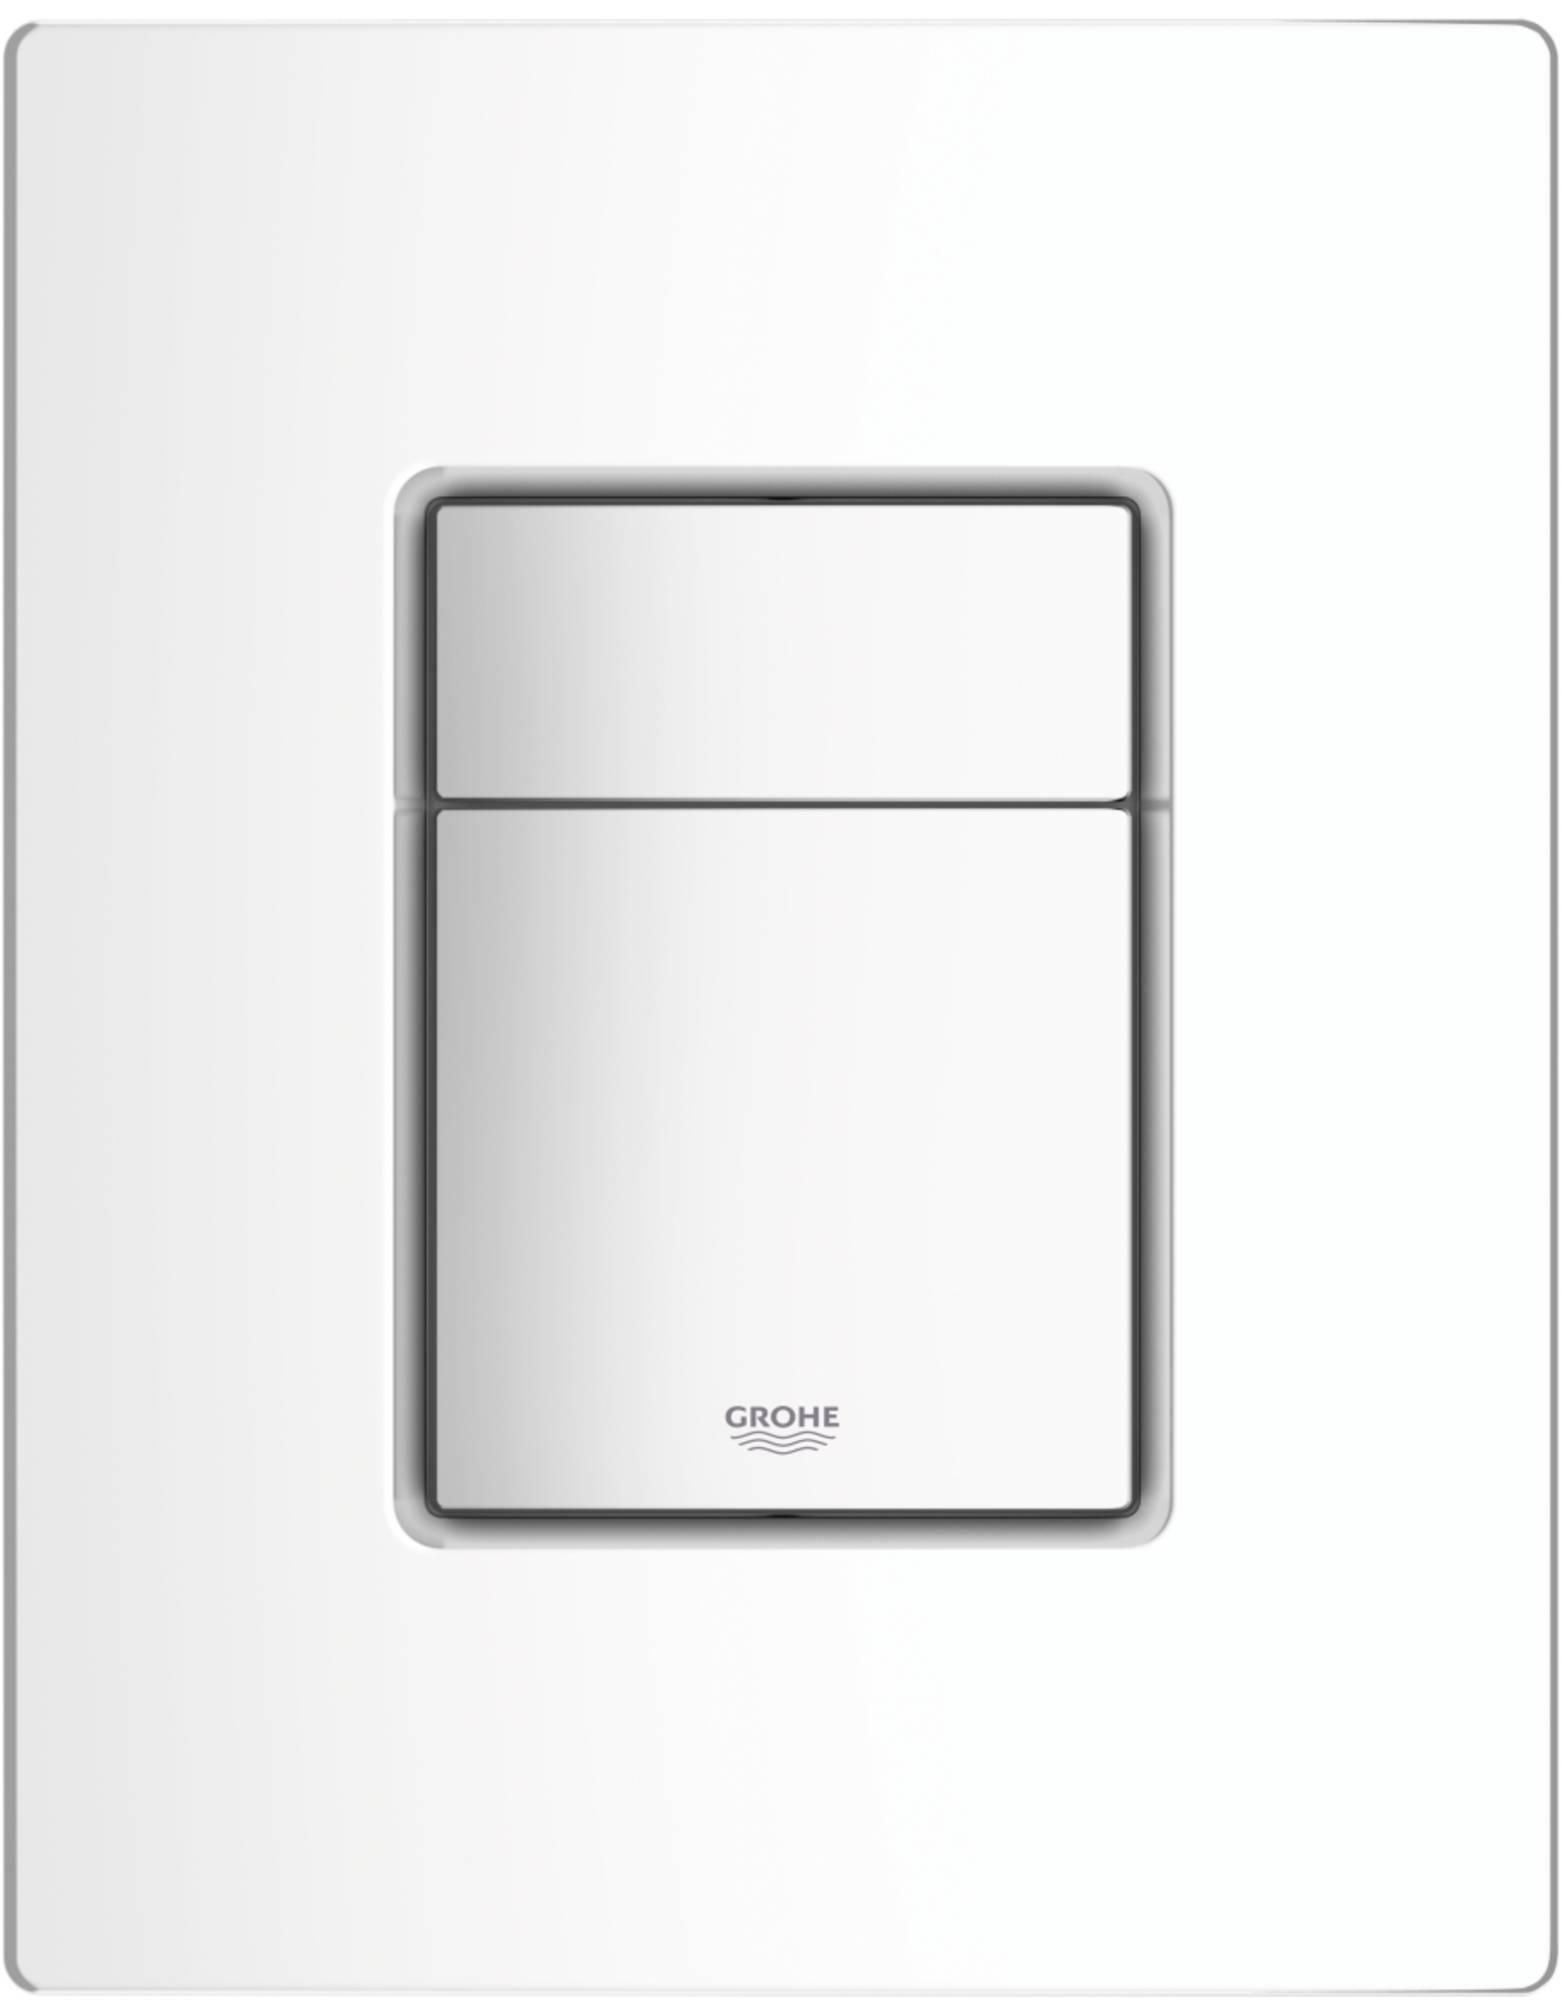 GROHE COSMO bedieningsplaat sl dual flush WIT (38732SH0)